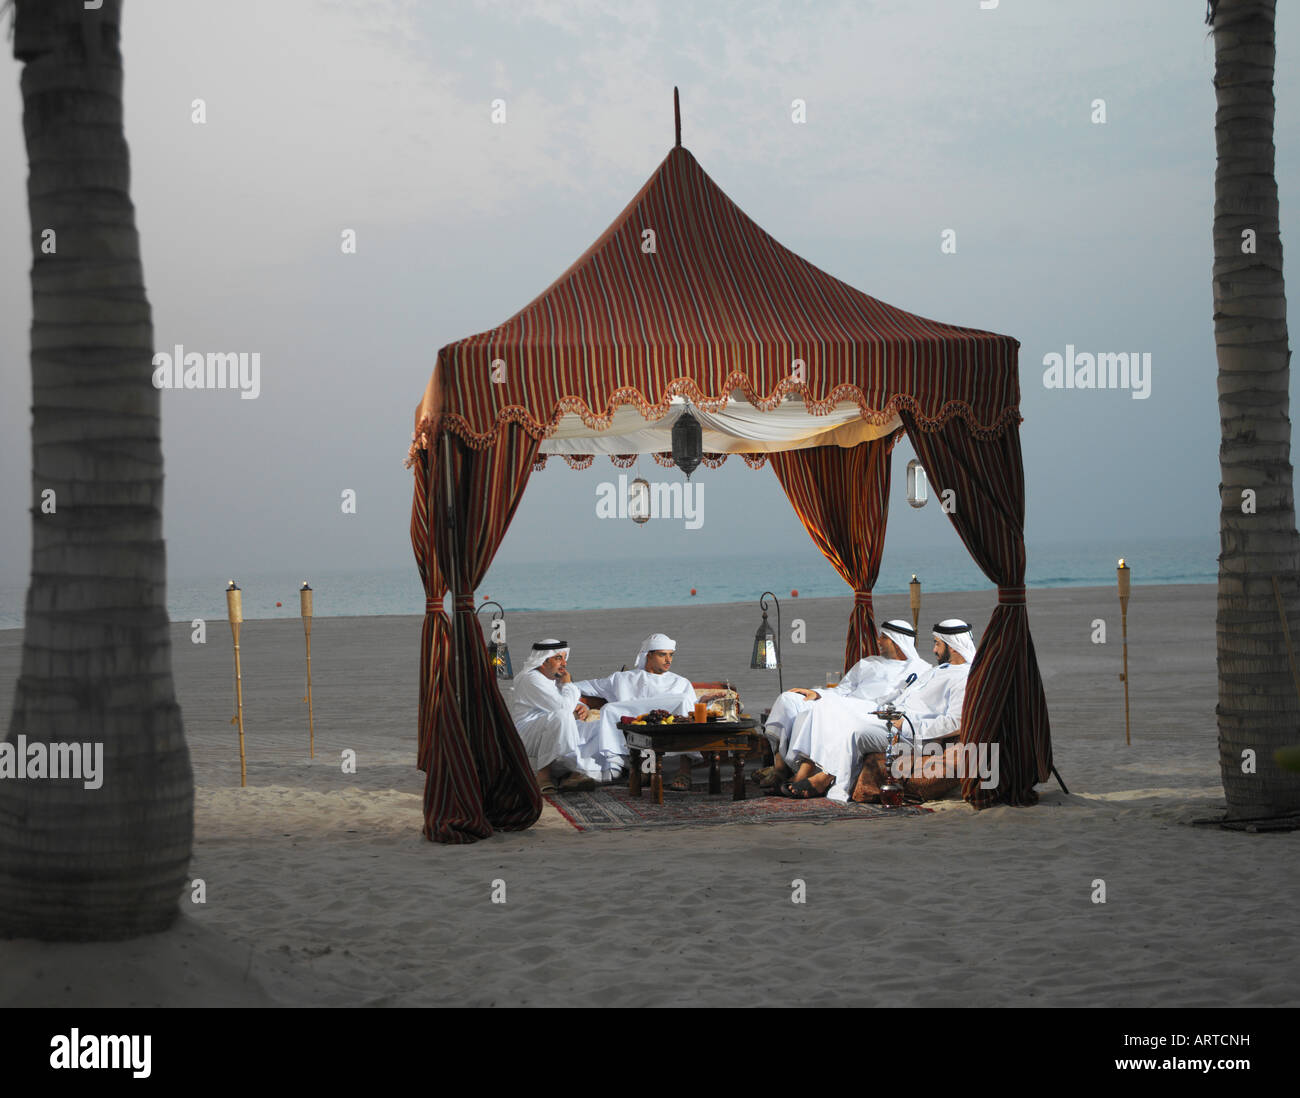 Ramadan Arab men sitting in Arabian tent for Iftar (fast-breaking meal after sunset & Ramadan: Arab men sitting in Arabian tent for Iftar (fast-breaking ...